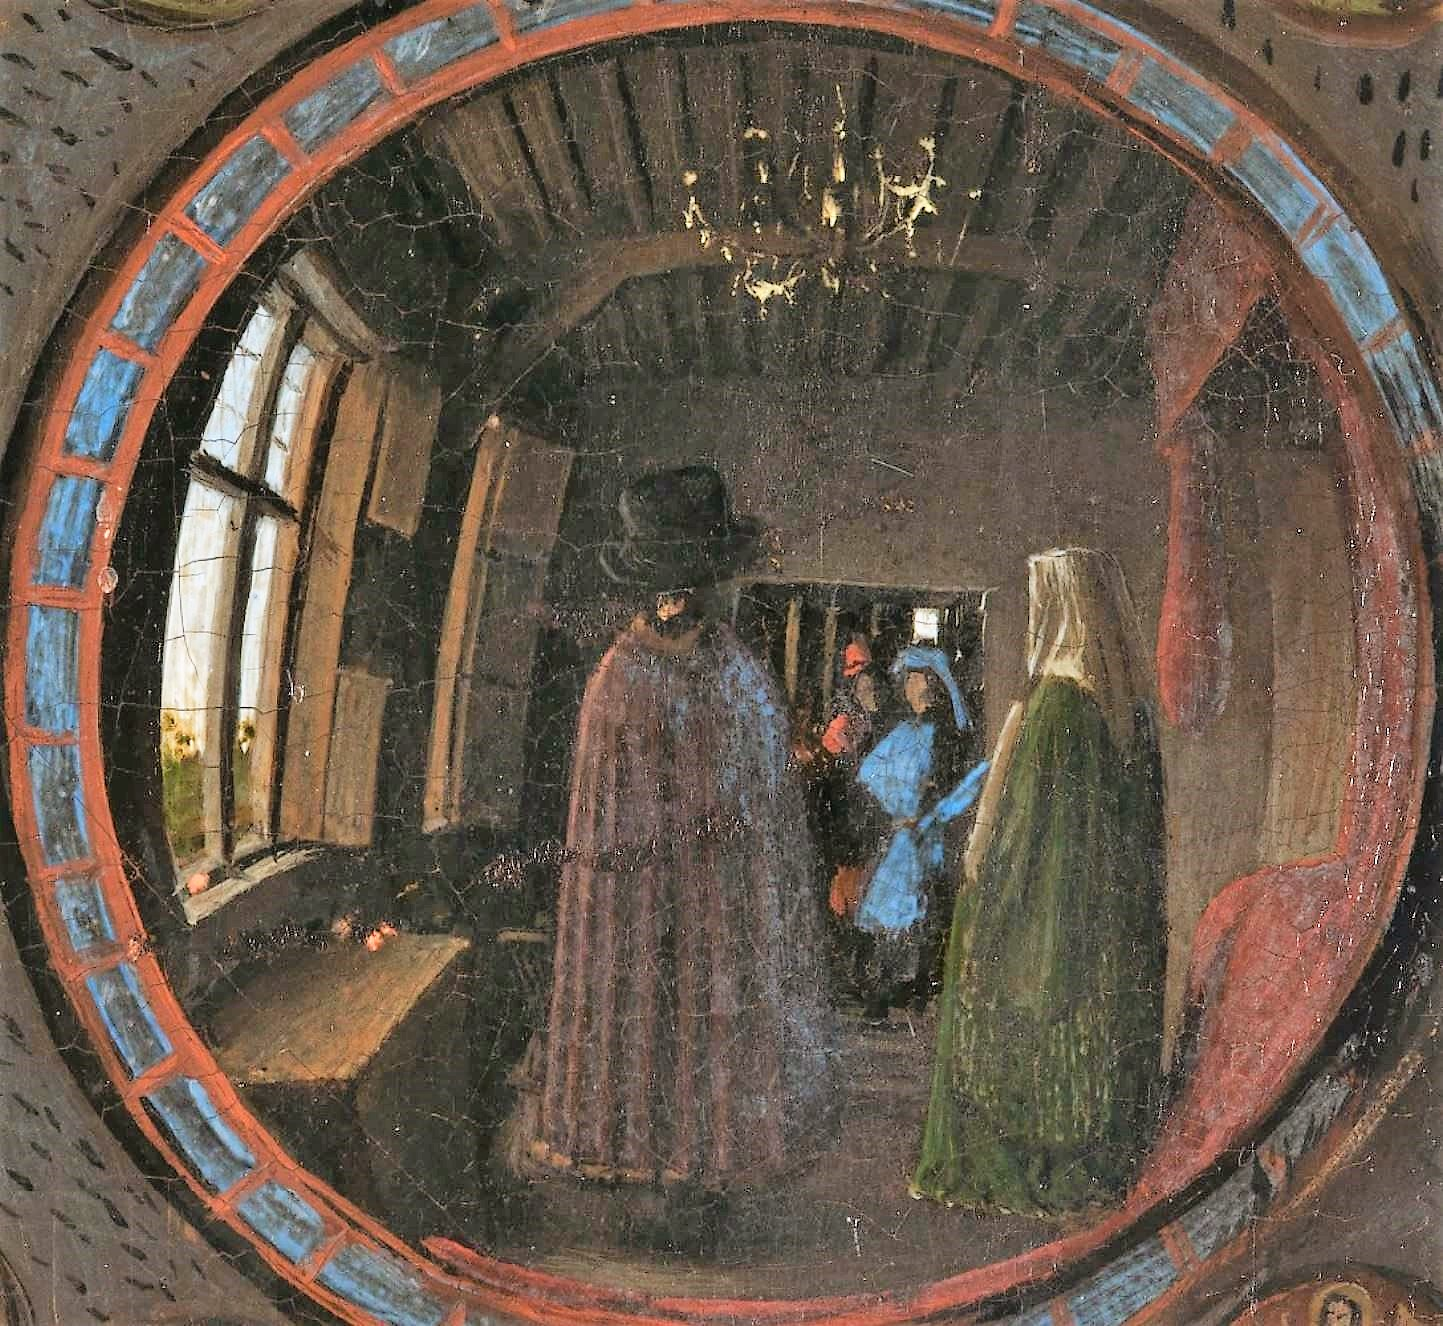 Van_Eyck 1434 _Arnolfini_Portrait reflet